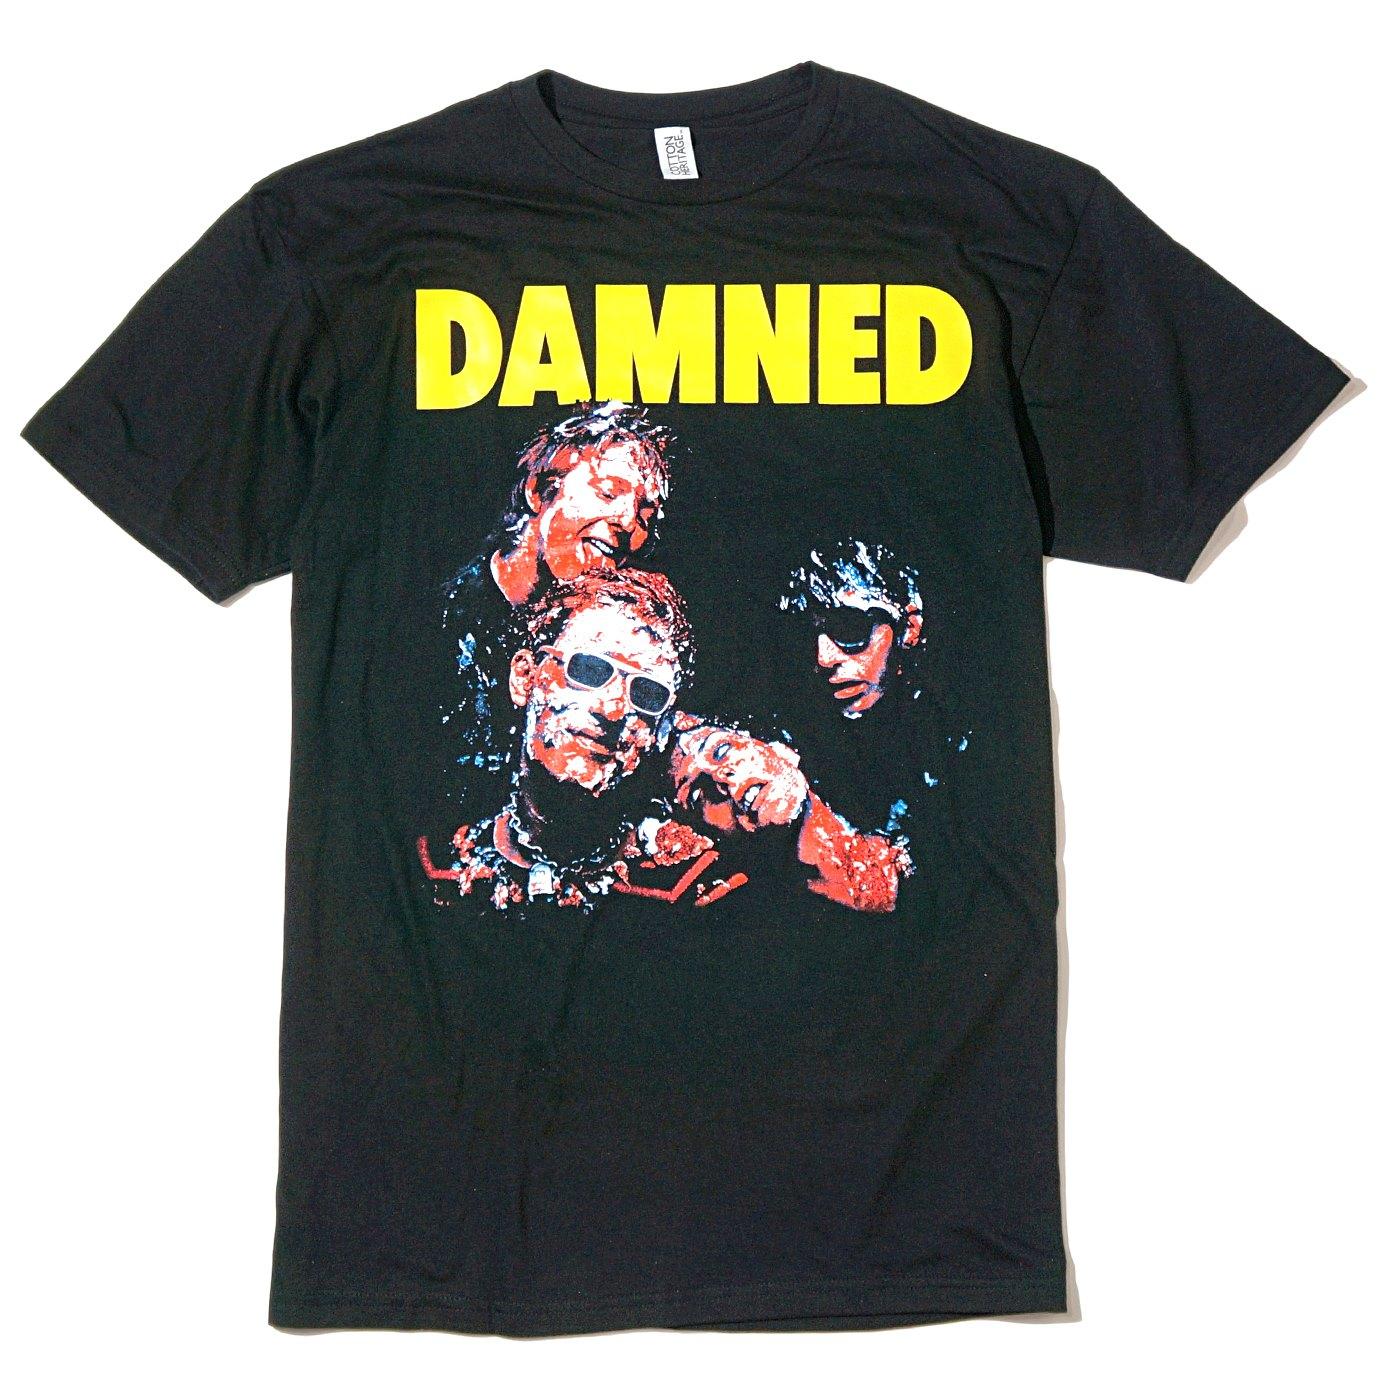 DAMNED Tシャツ Damned Damned Damned-Black